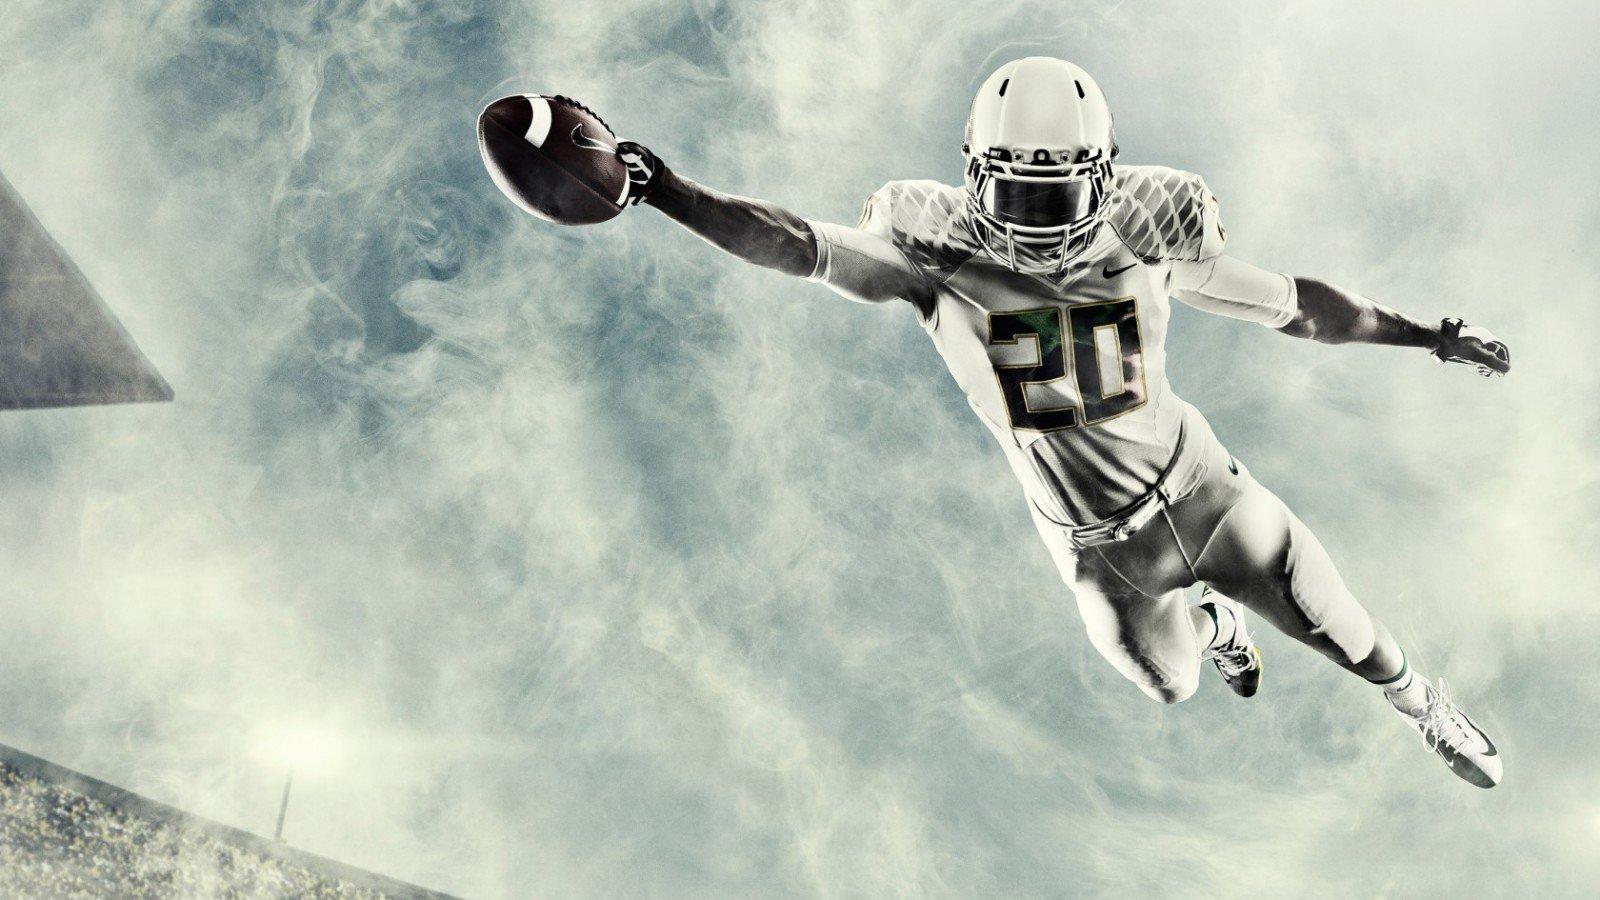 American Football HD wallpaper 1600x900